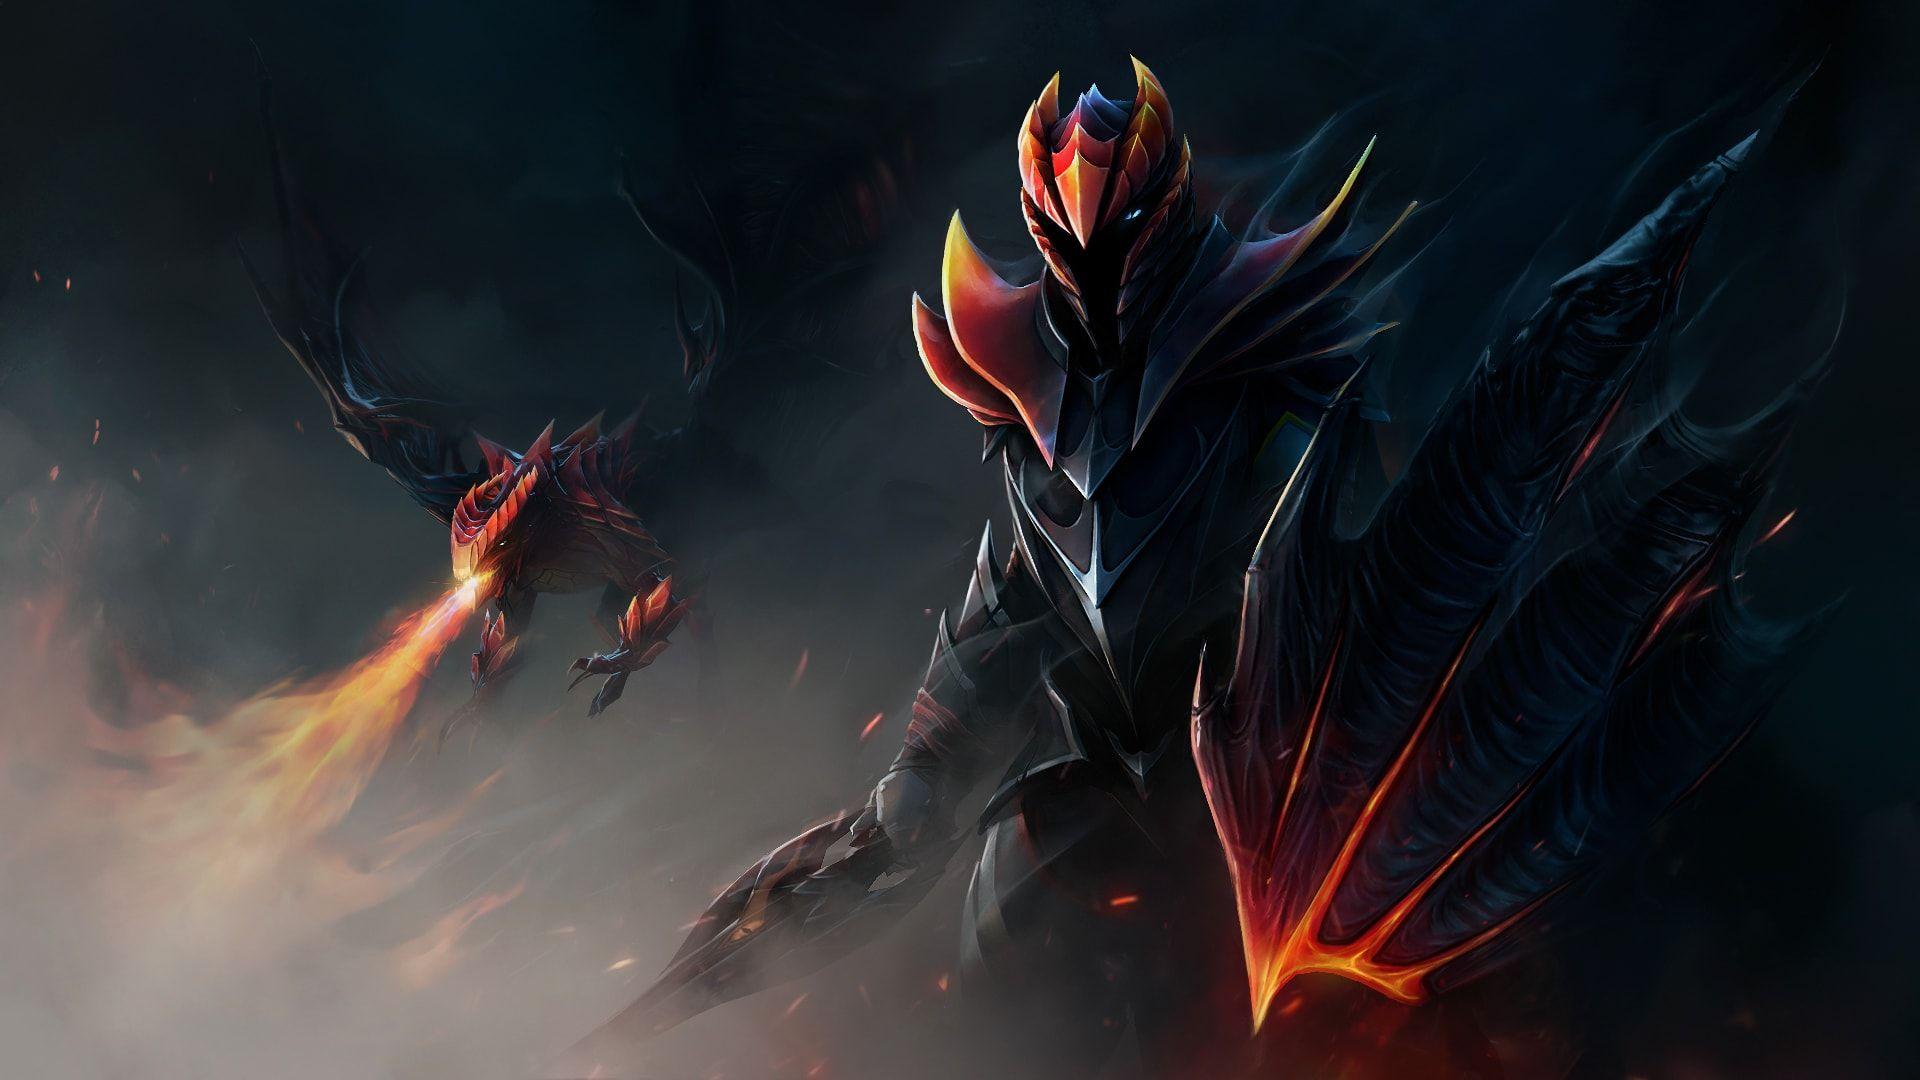 Dota 2 Dragon Knight Wallpaper Hd Dota 2 Dragon Knight